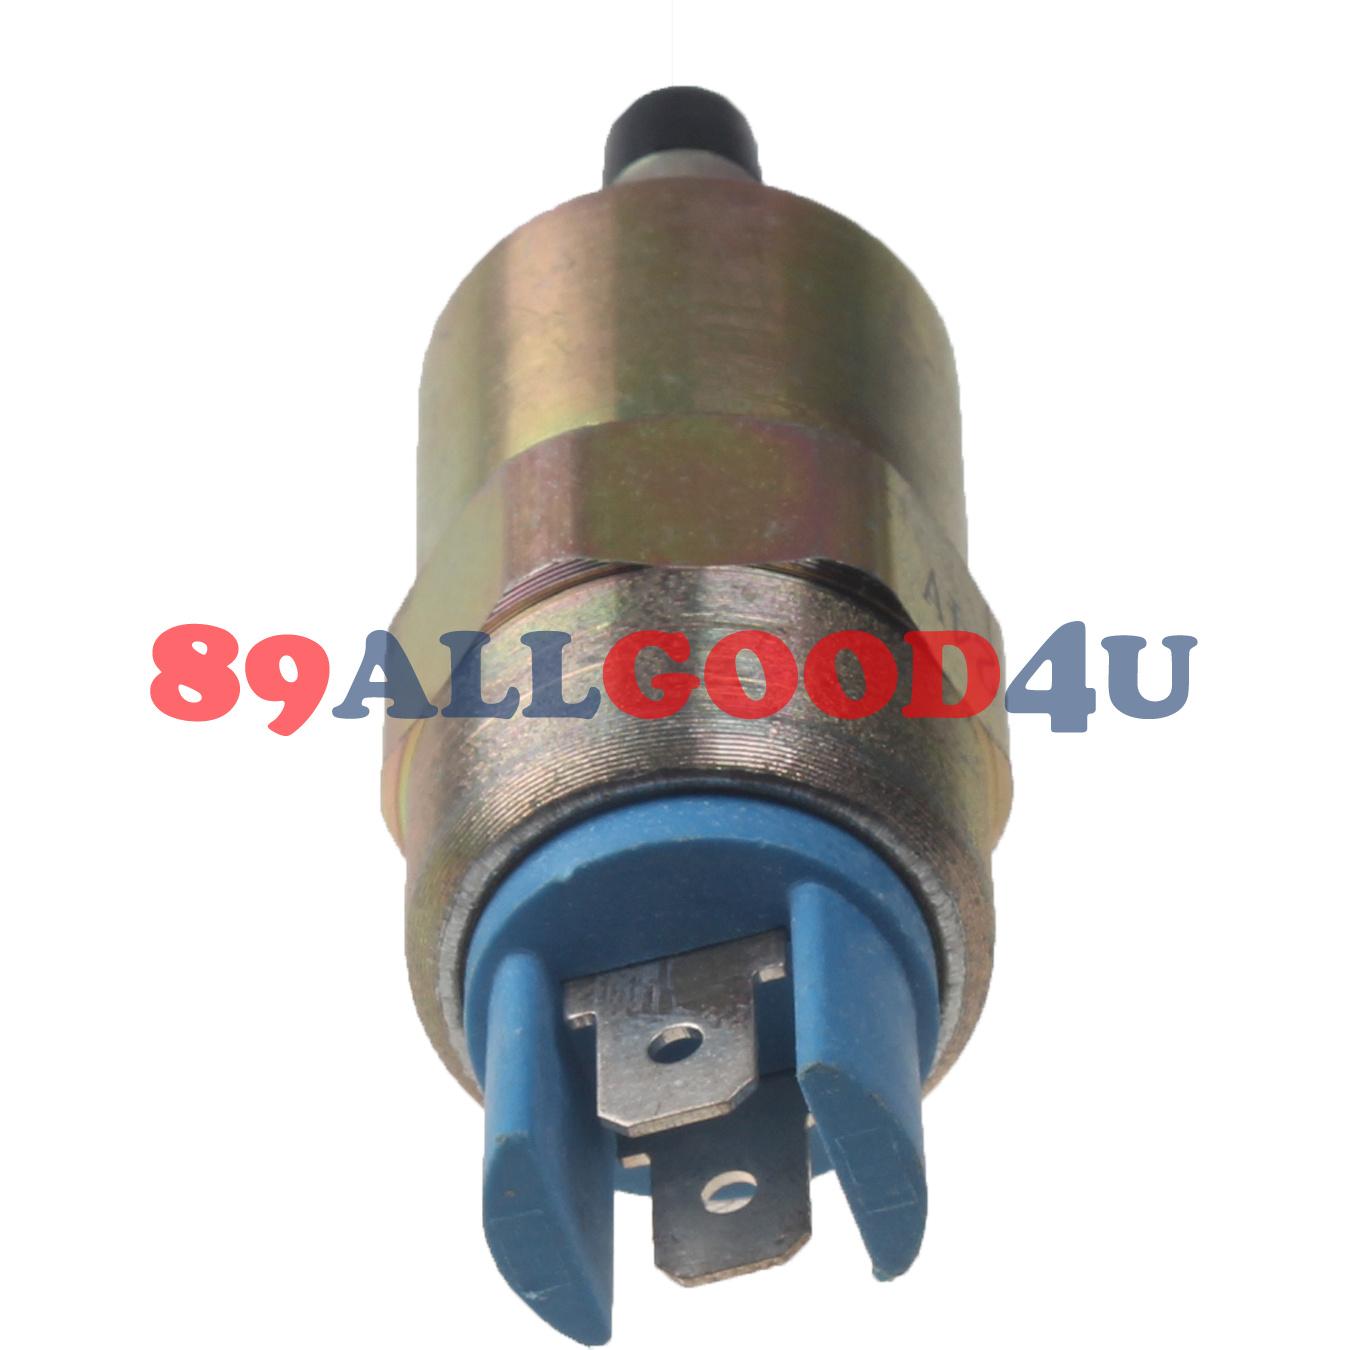 24V shutoff solenoid 7185-900P 71800-049D for Delphi DP200 Pump Lucas CAV